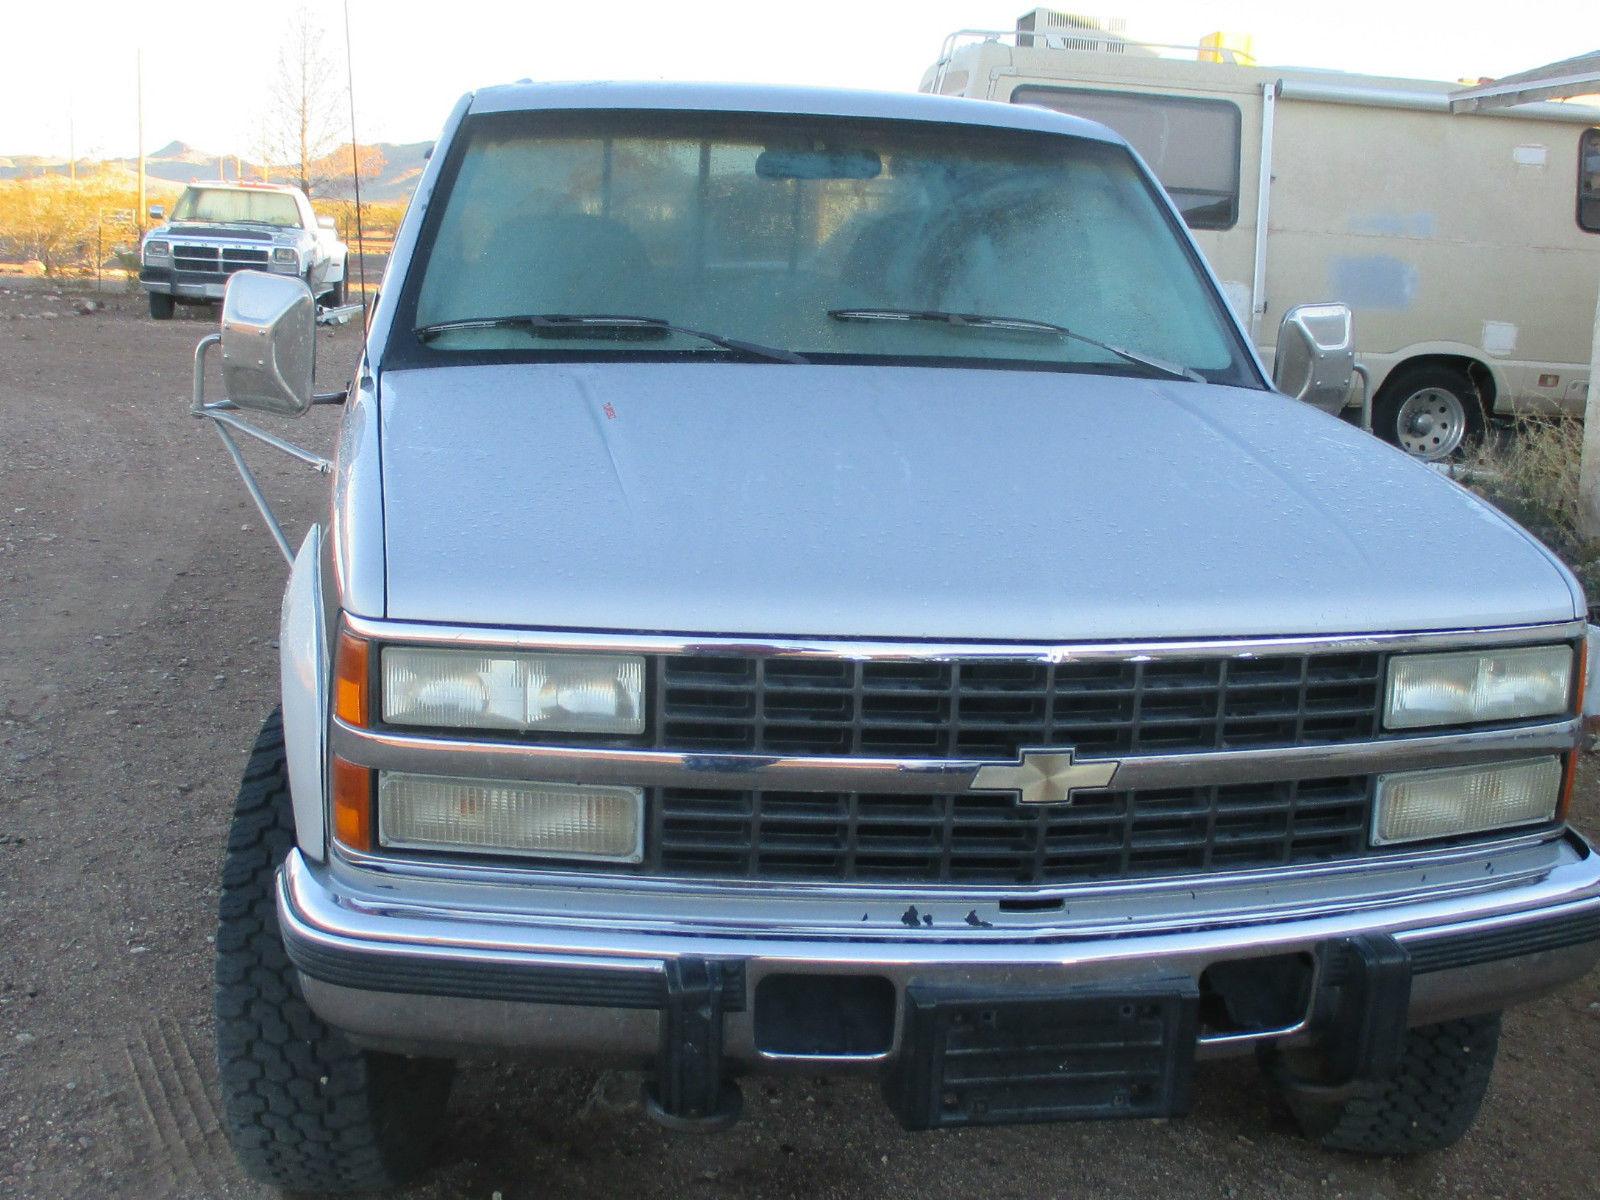 1993 chevrolet chevy silverado 1 ton turbo diesel 4 door 4x4 crew cab classic chevrolet. Black Bedroom Furniture Sets. Home Design Ideas